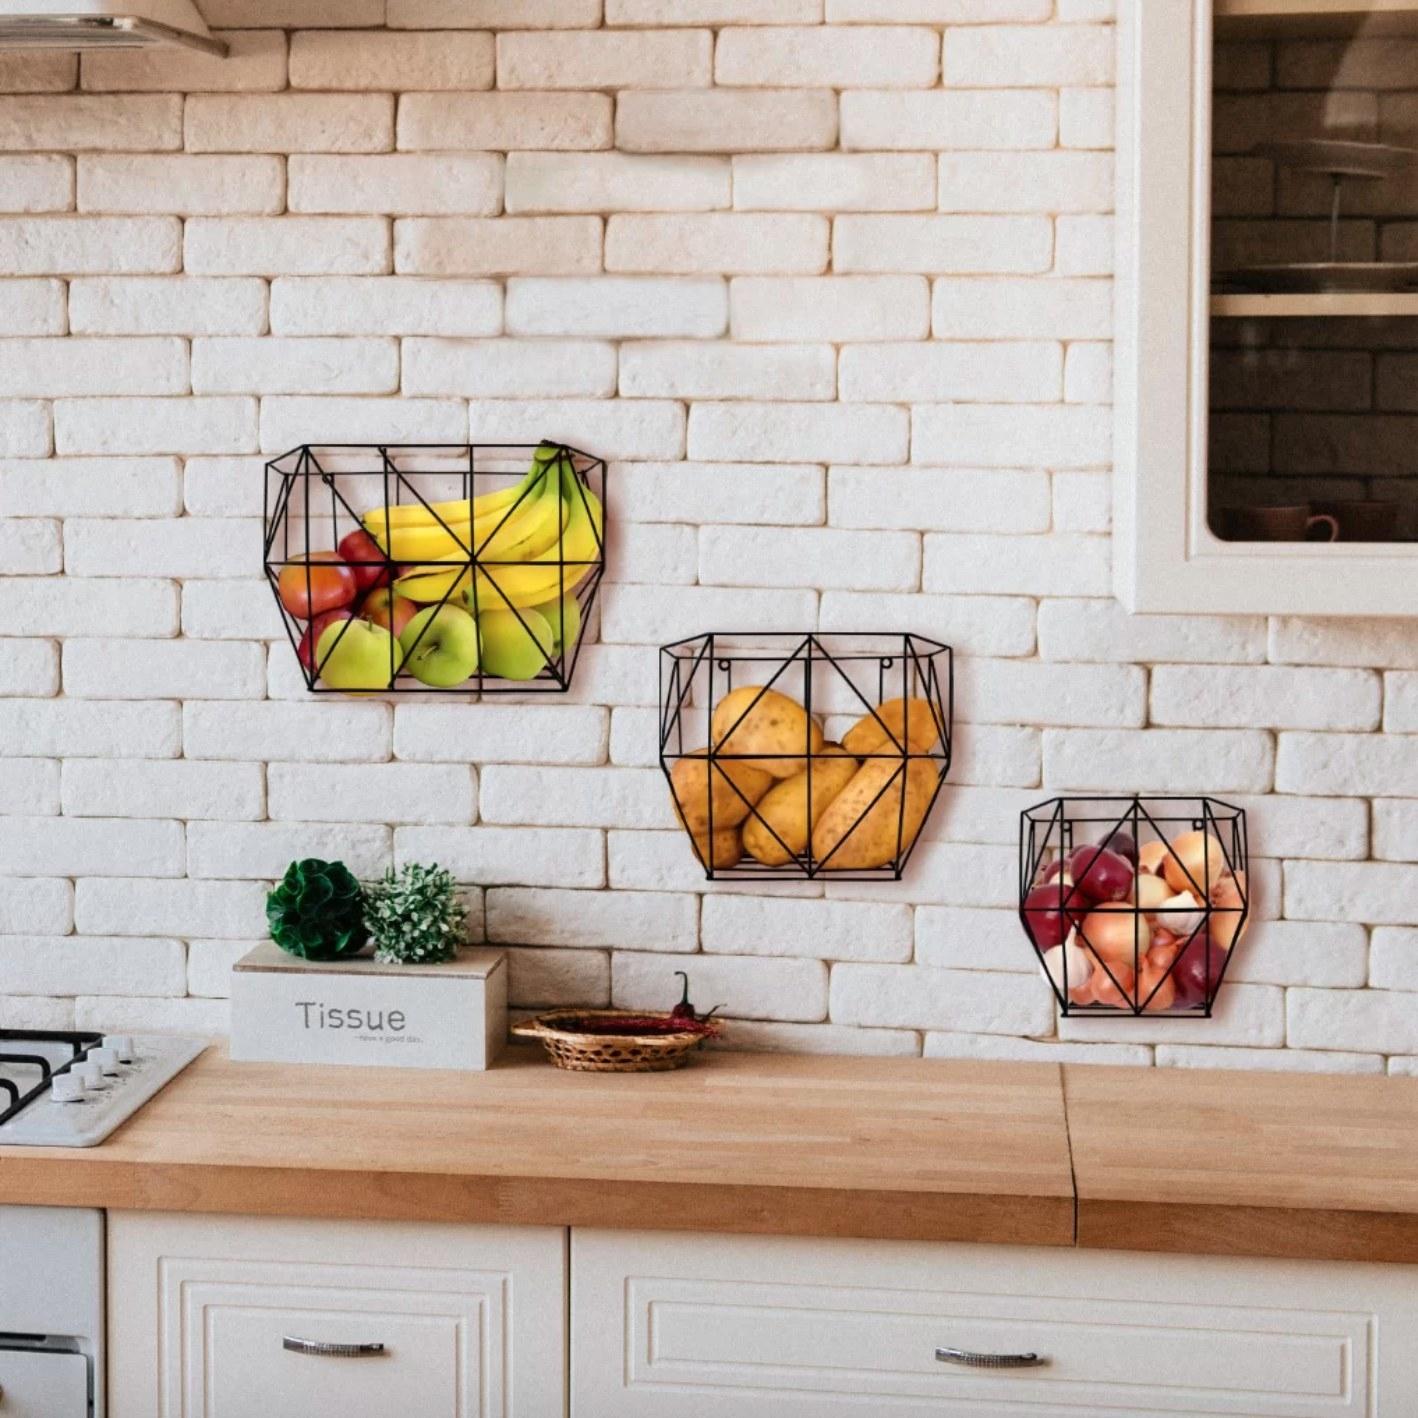 three metal wall baskets holding produce